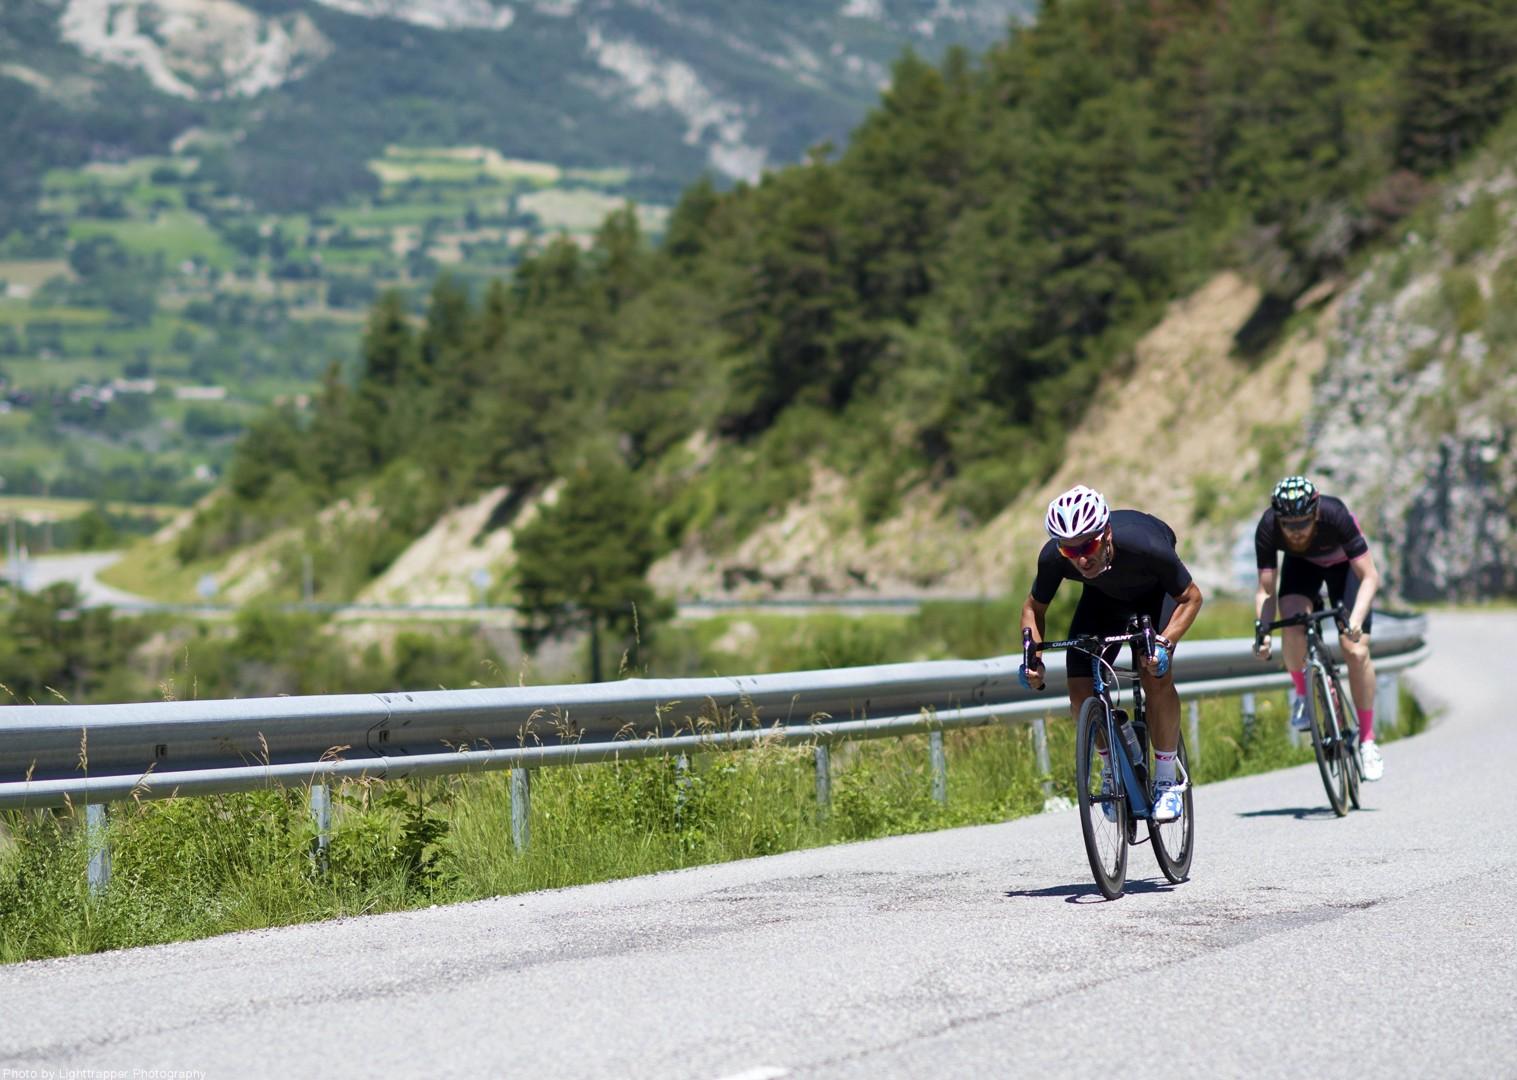 holiday-france-provence-road-cycling-col-climb.jpg - France - Provence - Alpes Maritimes - Guided Road Cycling Holiday - Road Cycling